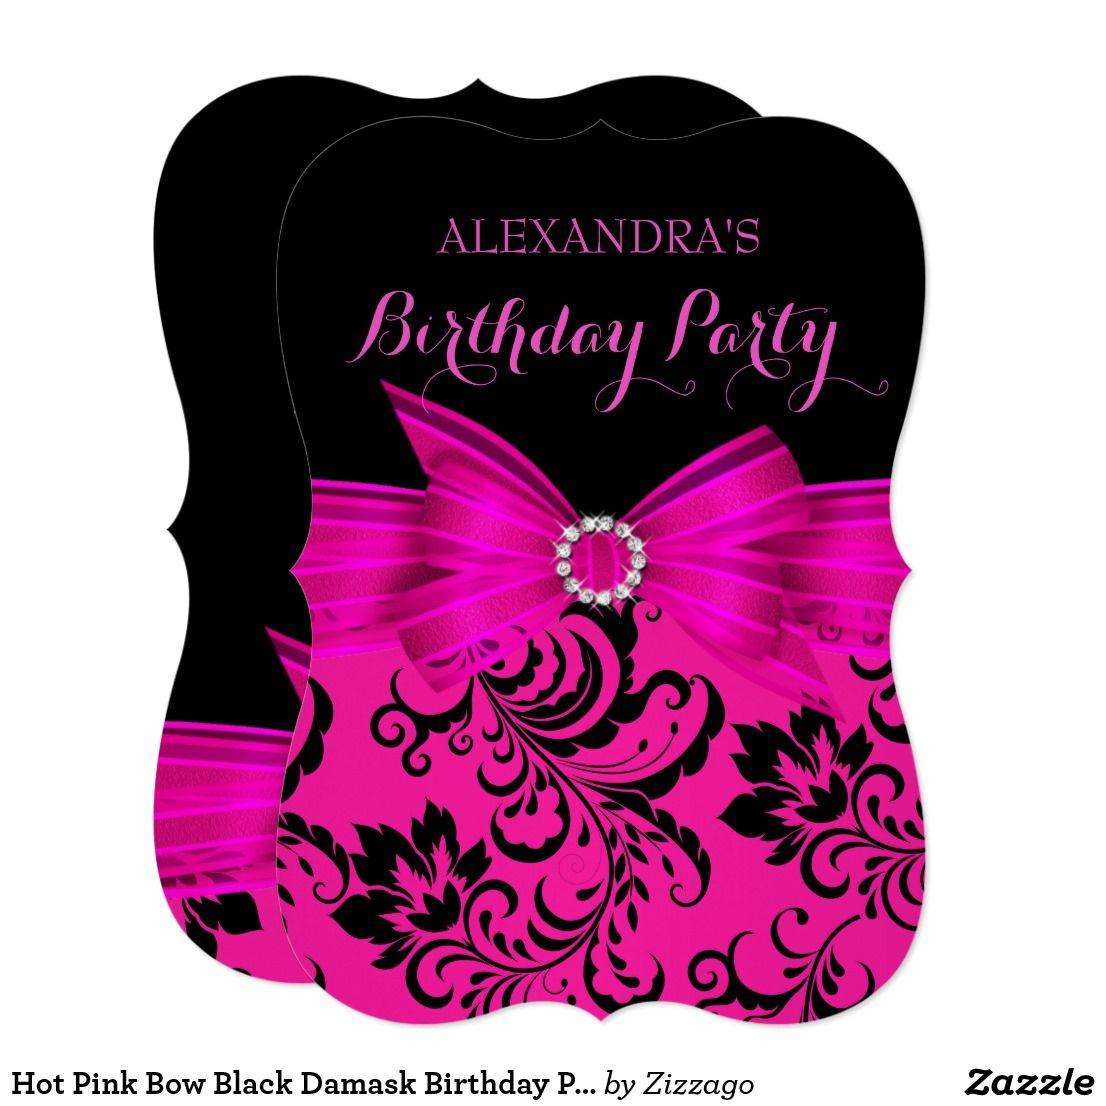 Hot Pink Bow Black Damask Birthday Party Invitation | Sweet sixteen ...